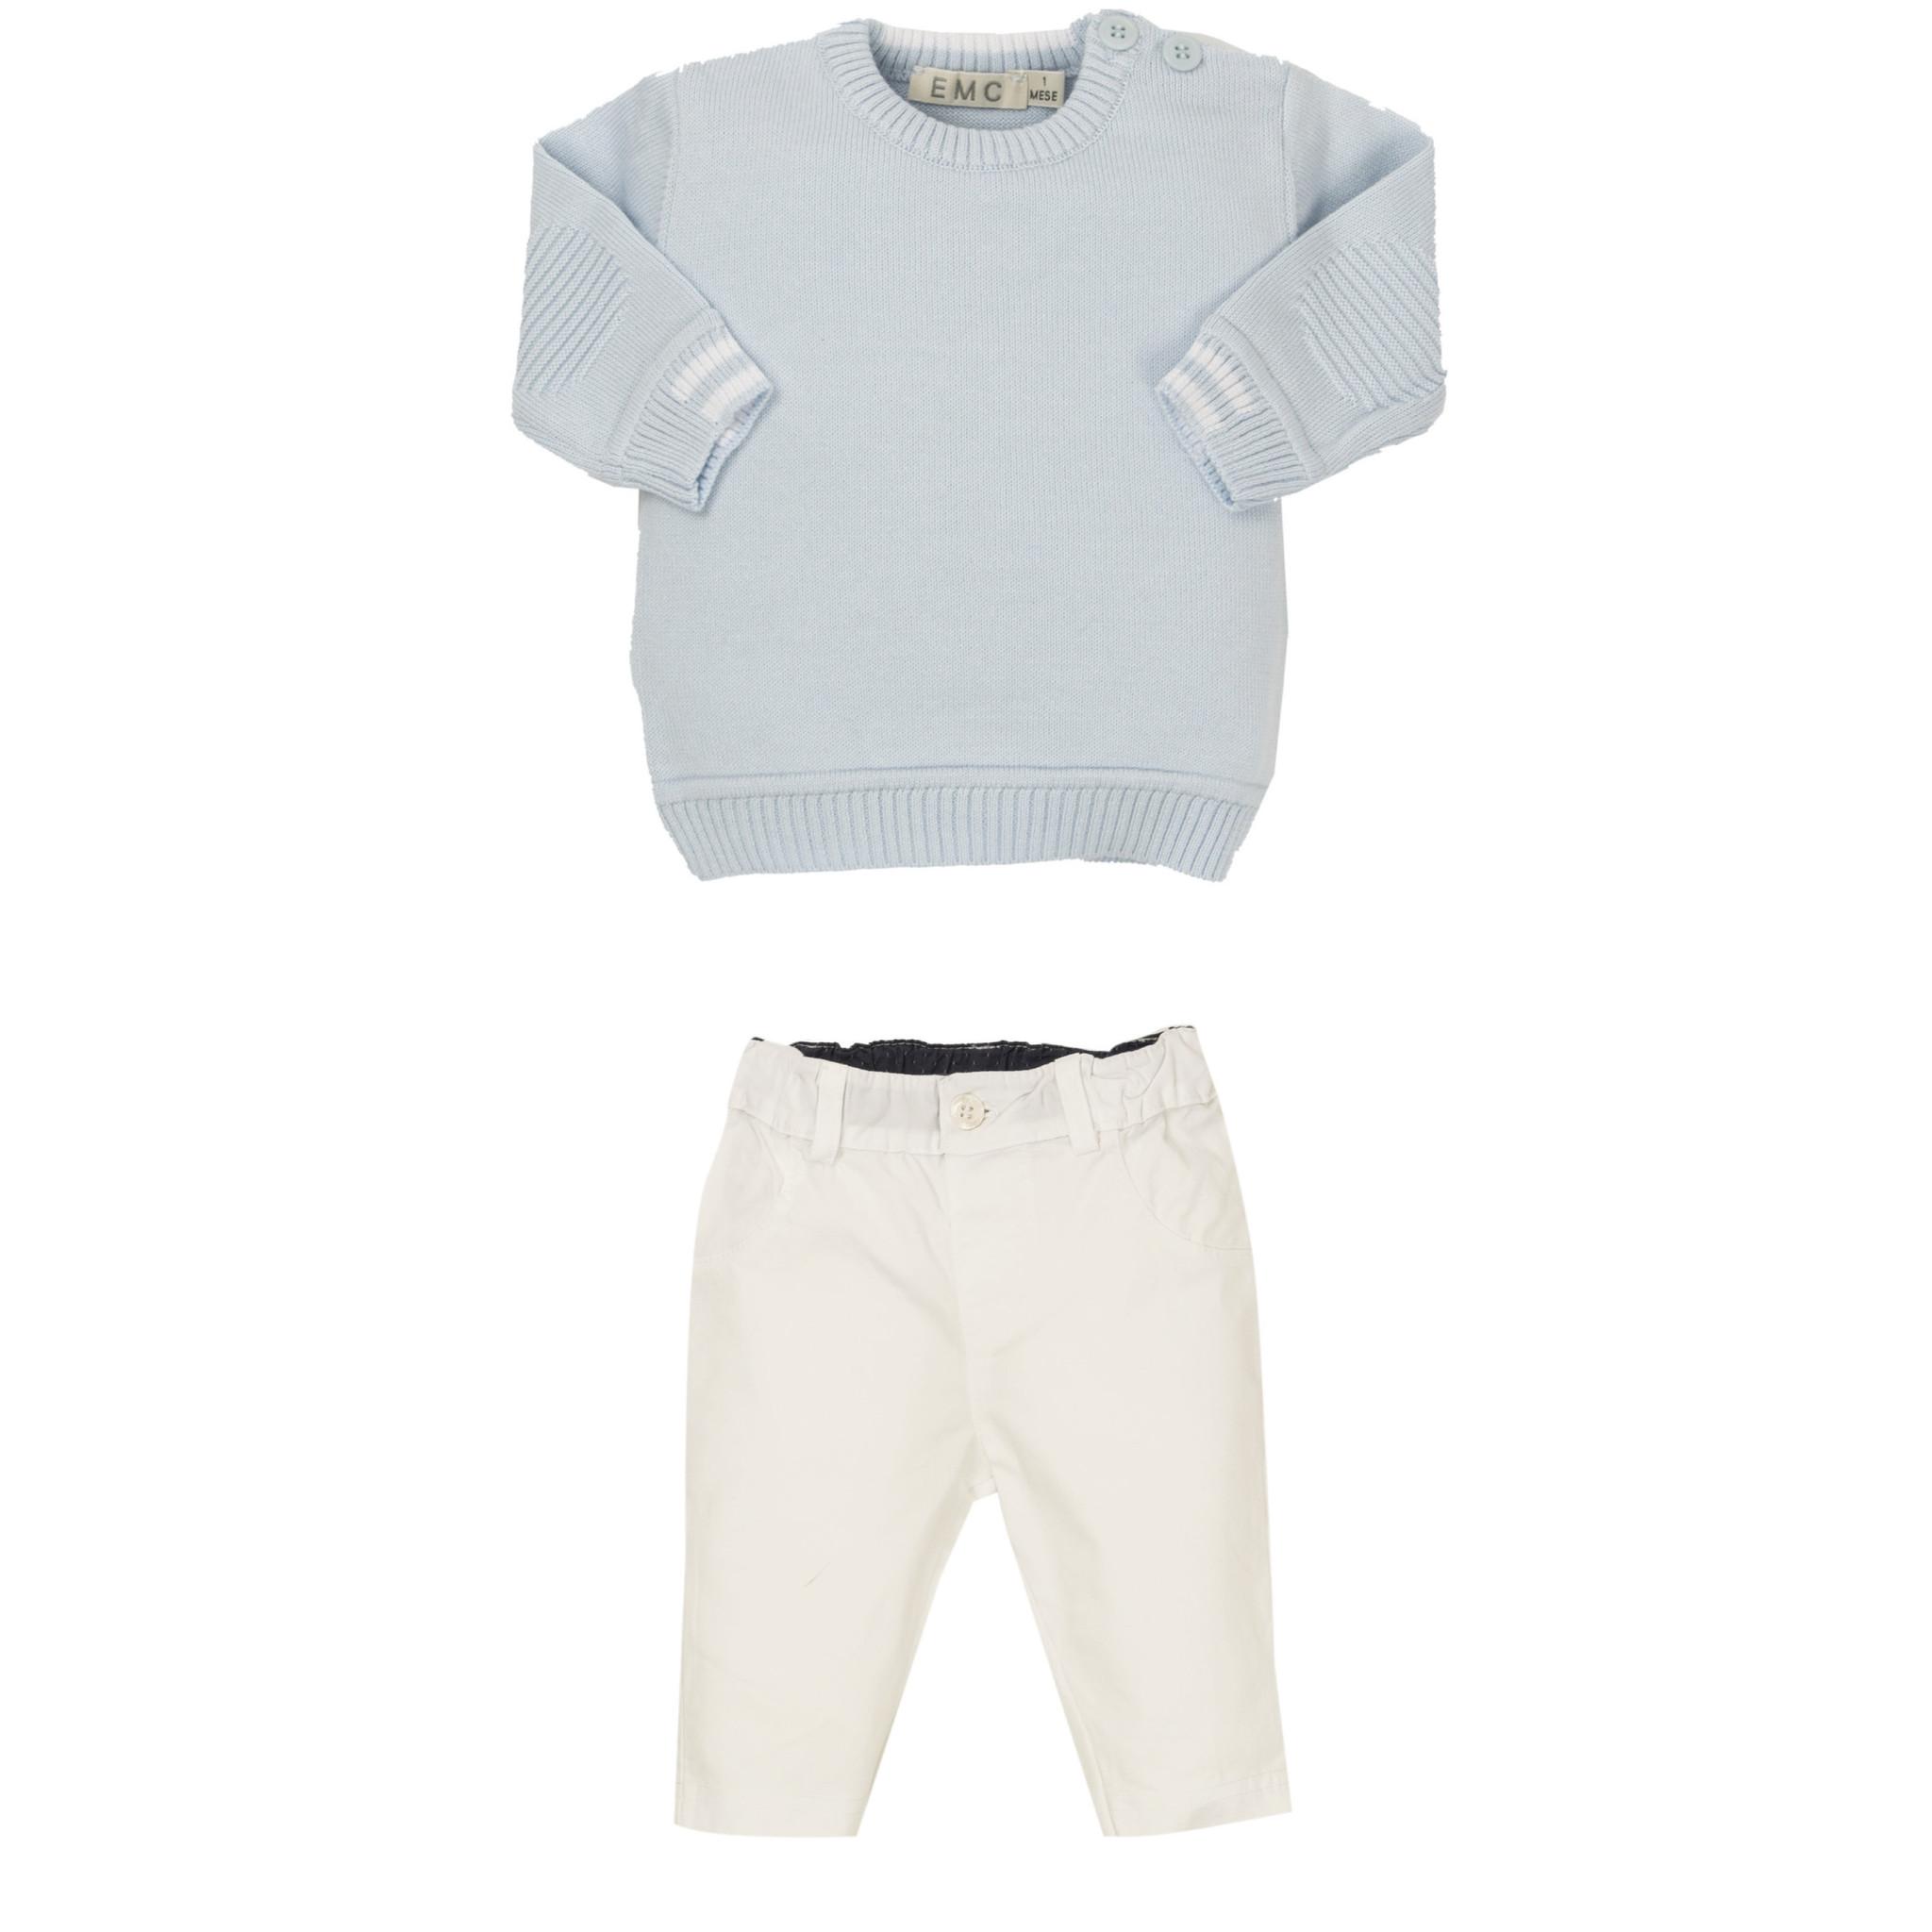 EMC EMC Pale Blue Knit Trouser Set 1605 S21